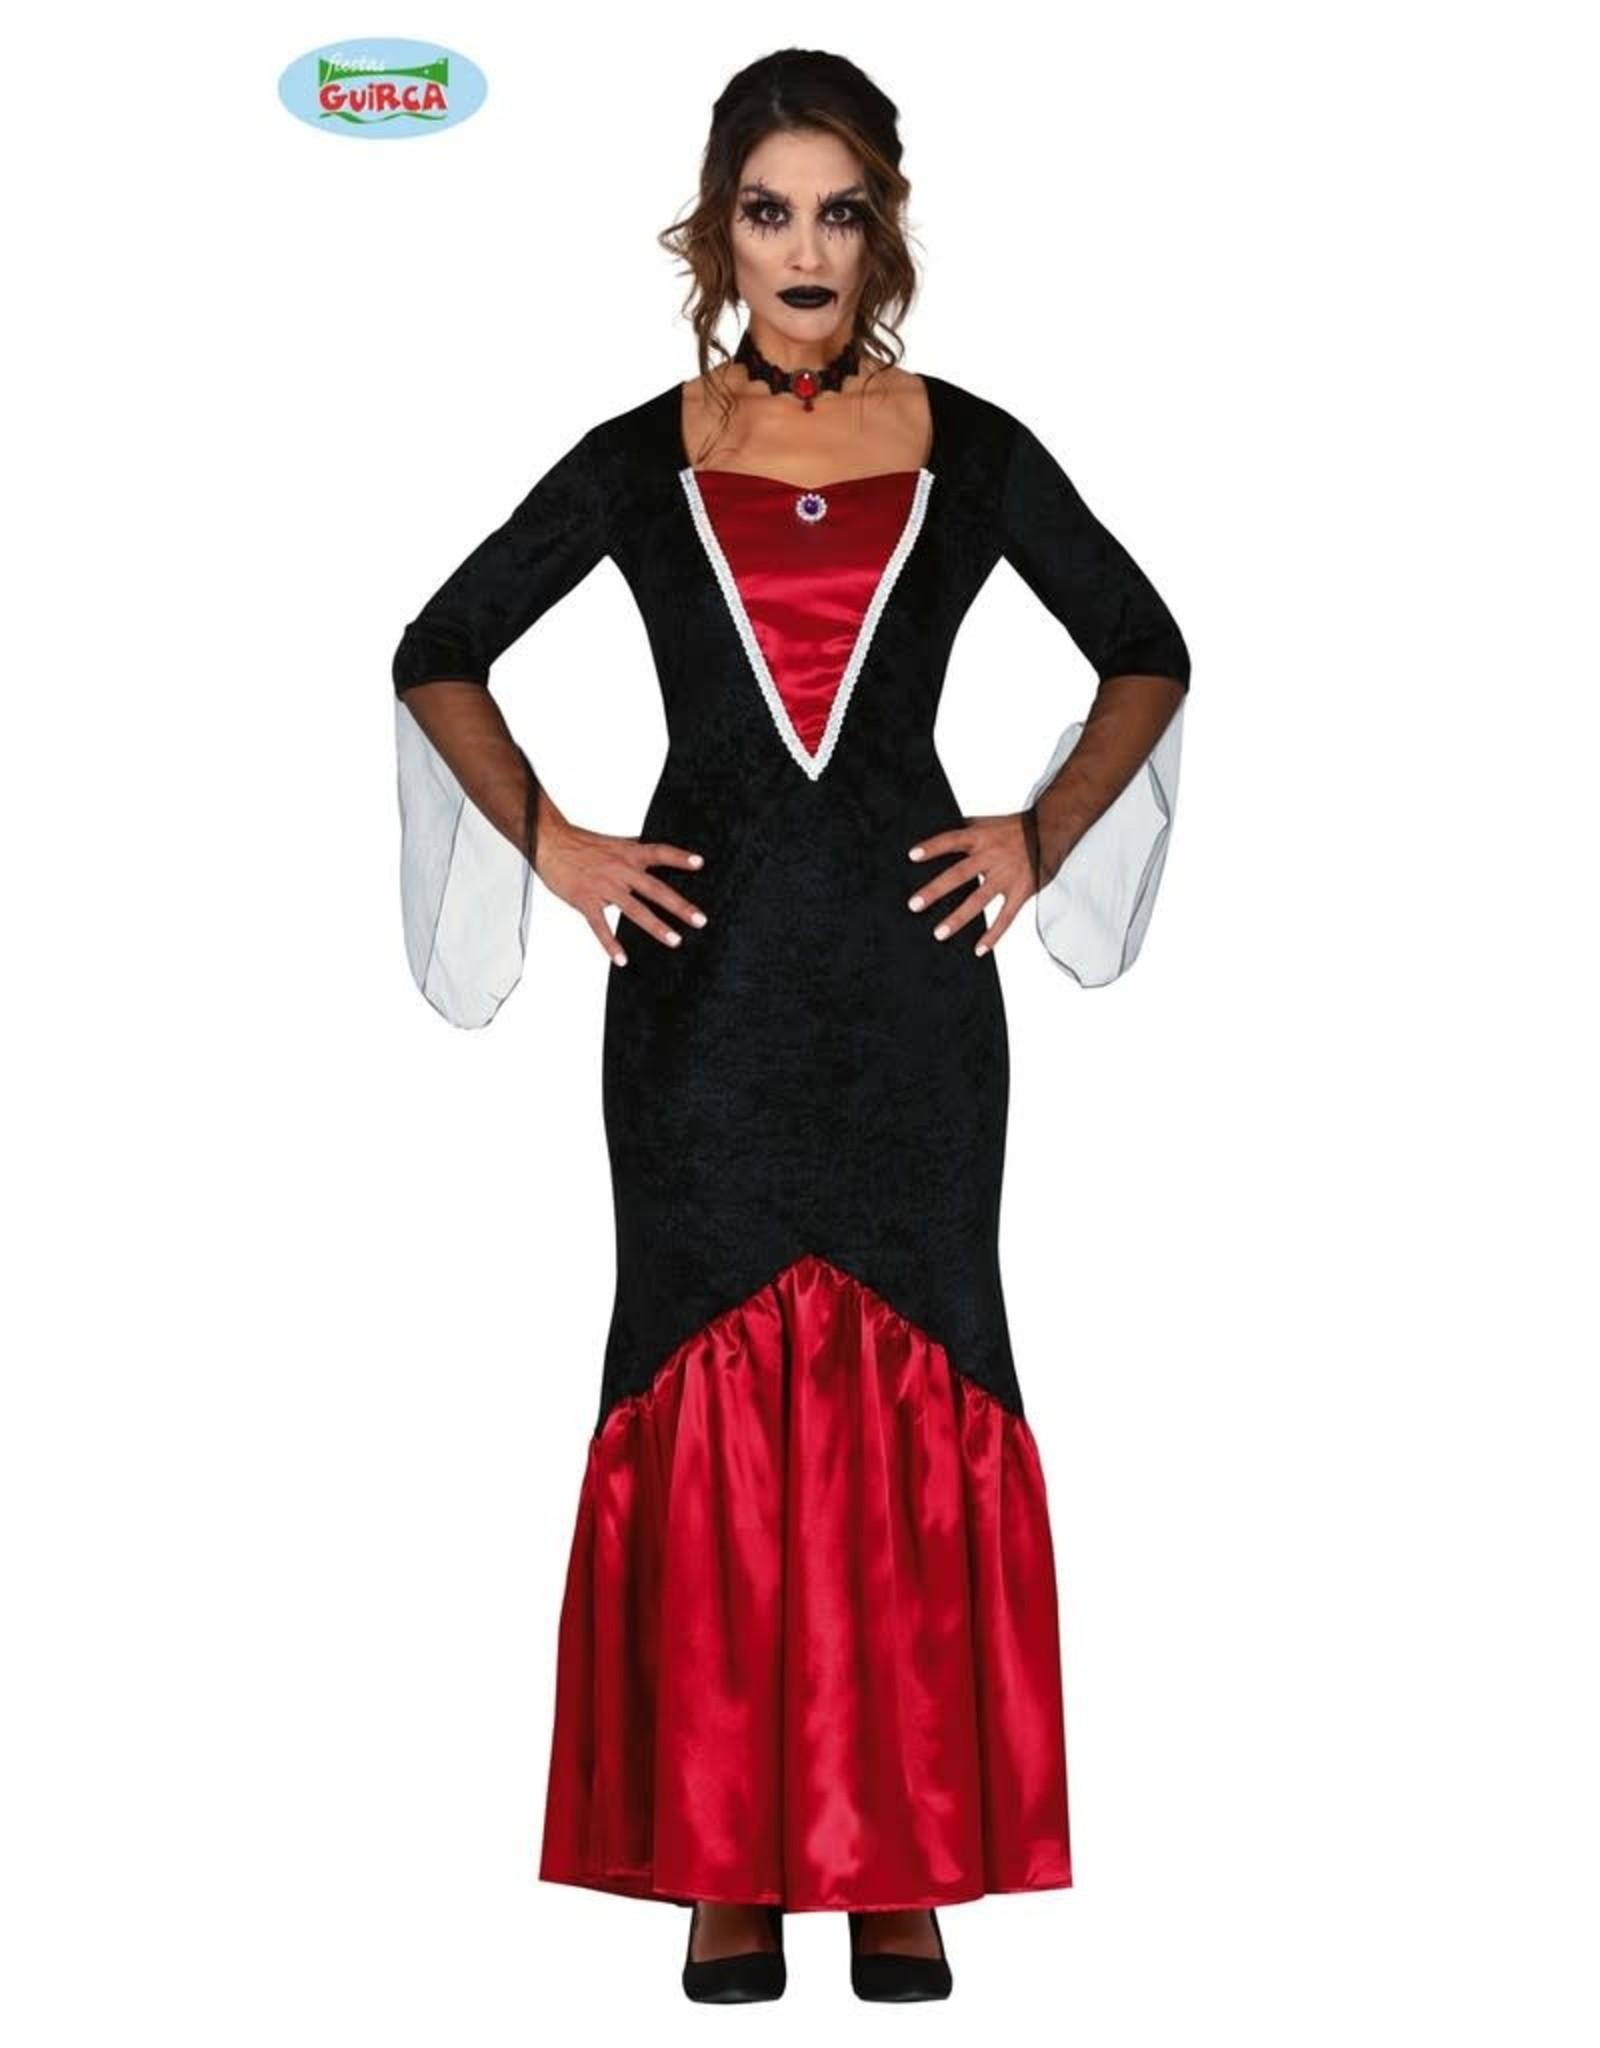 FIESTAS GUIRCA vampires met rode rok